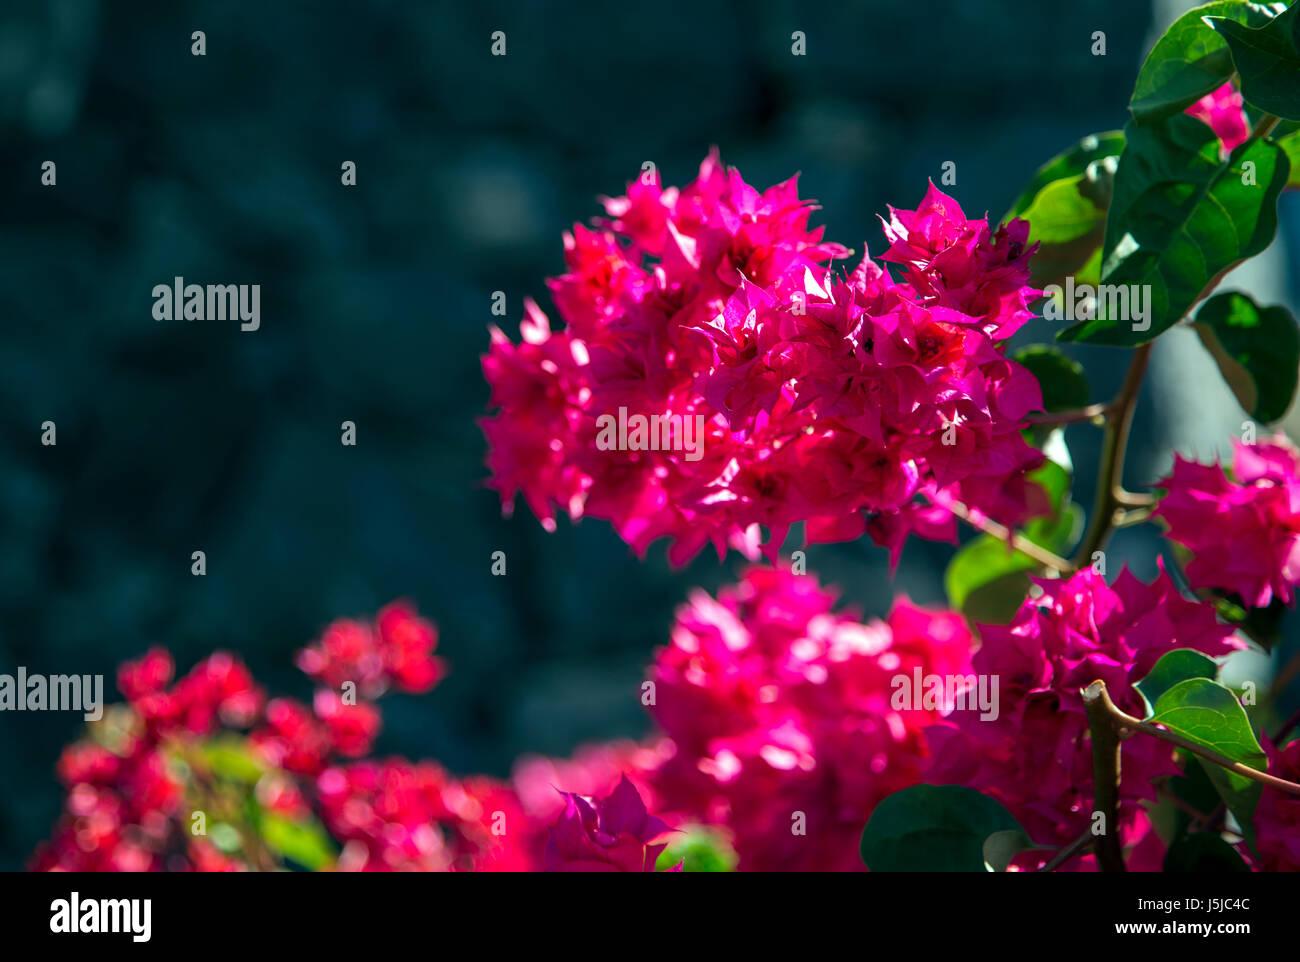 Small fuchsia flowers (Bougainvillea Glabra) close-up, Tenerife, Spain - Stock Image